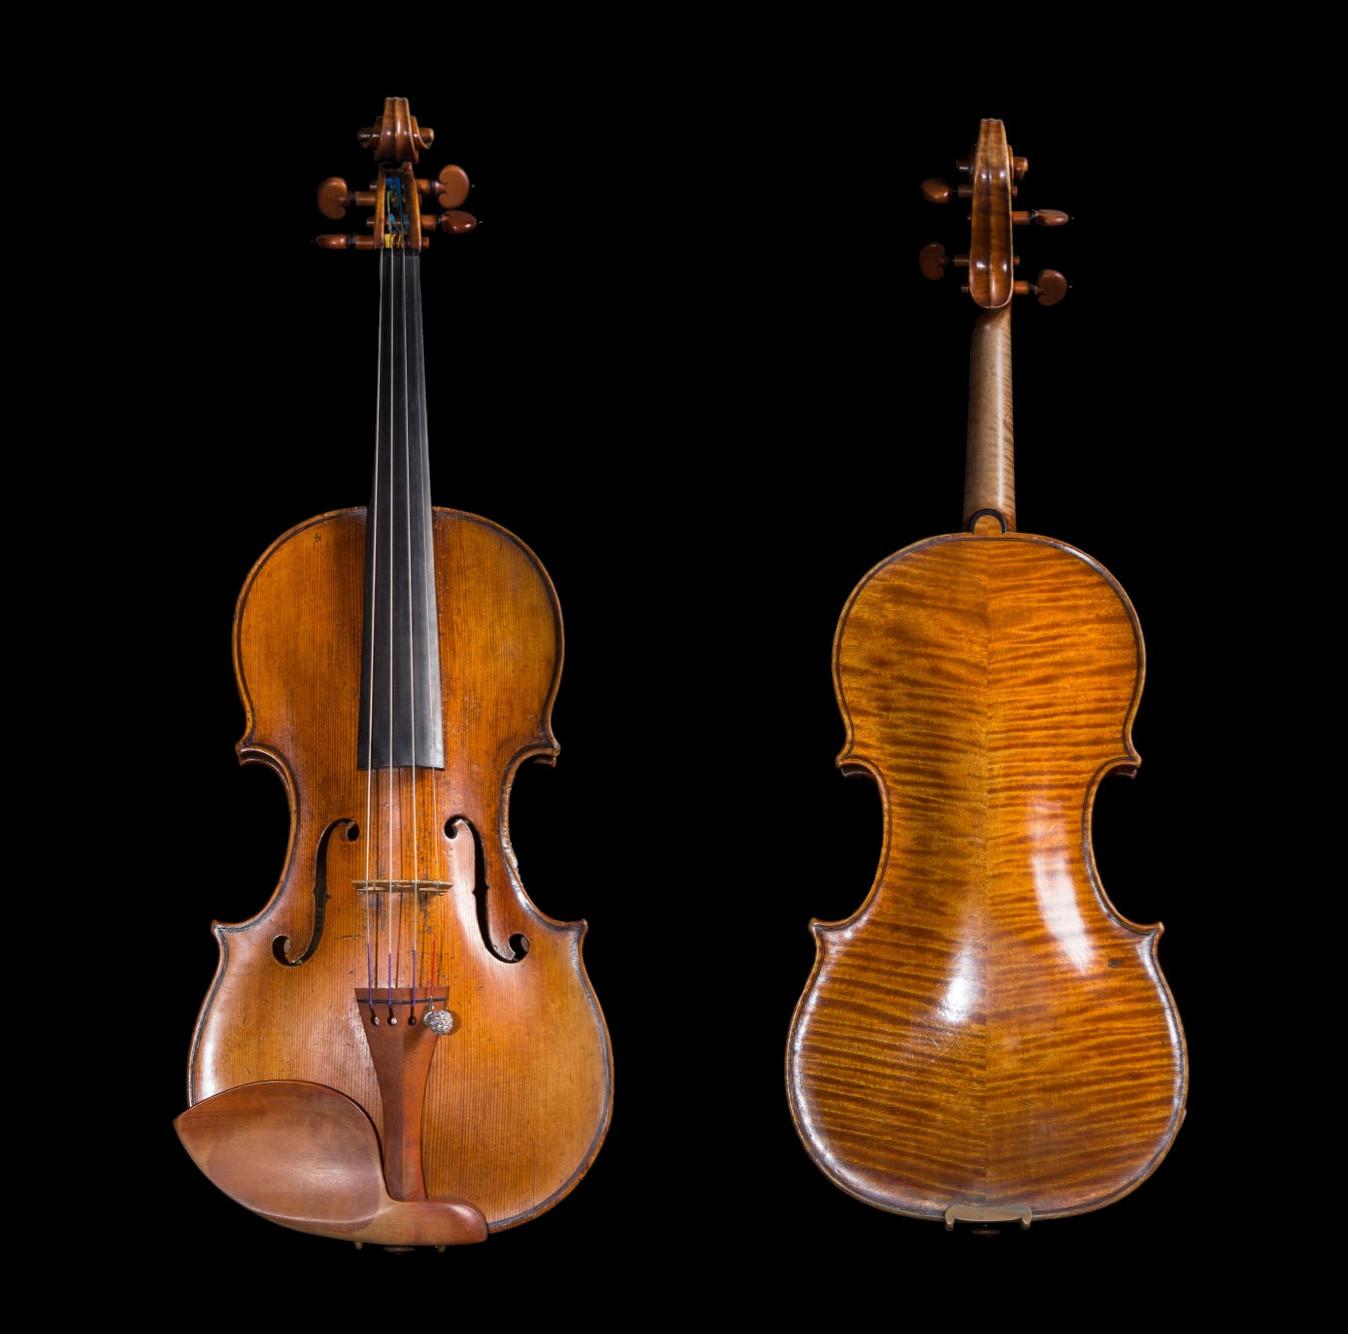 Chee-Yun: Violinist